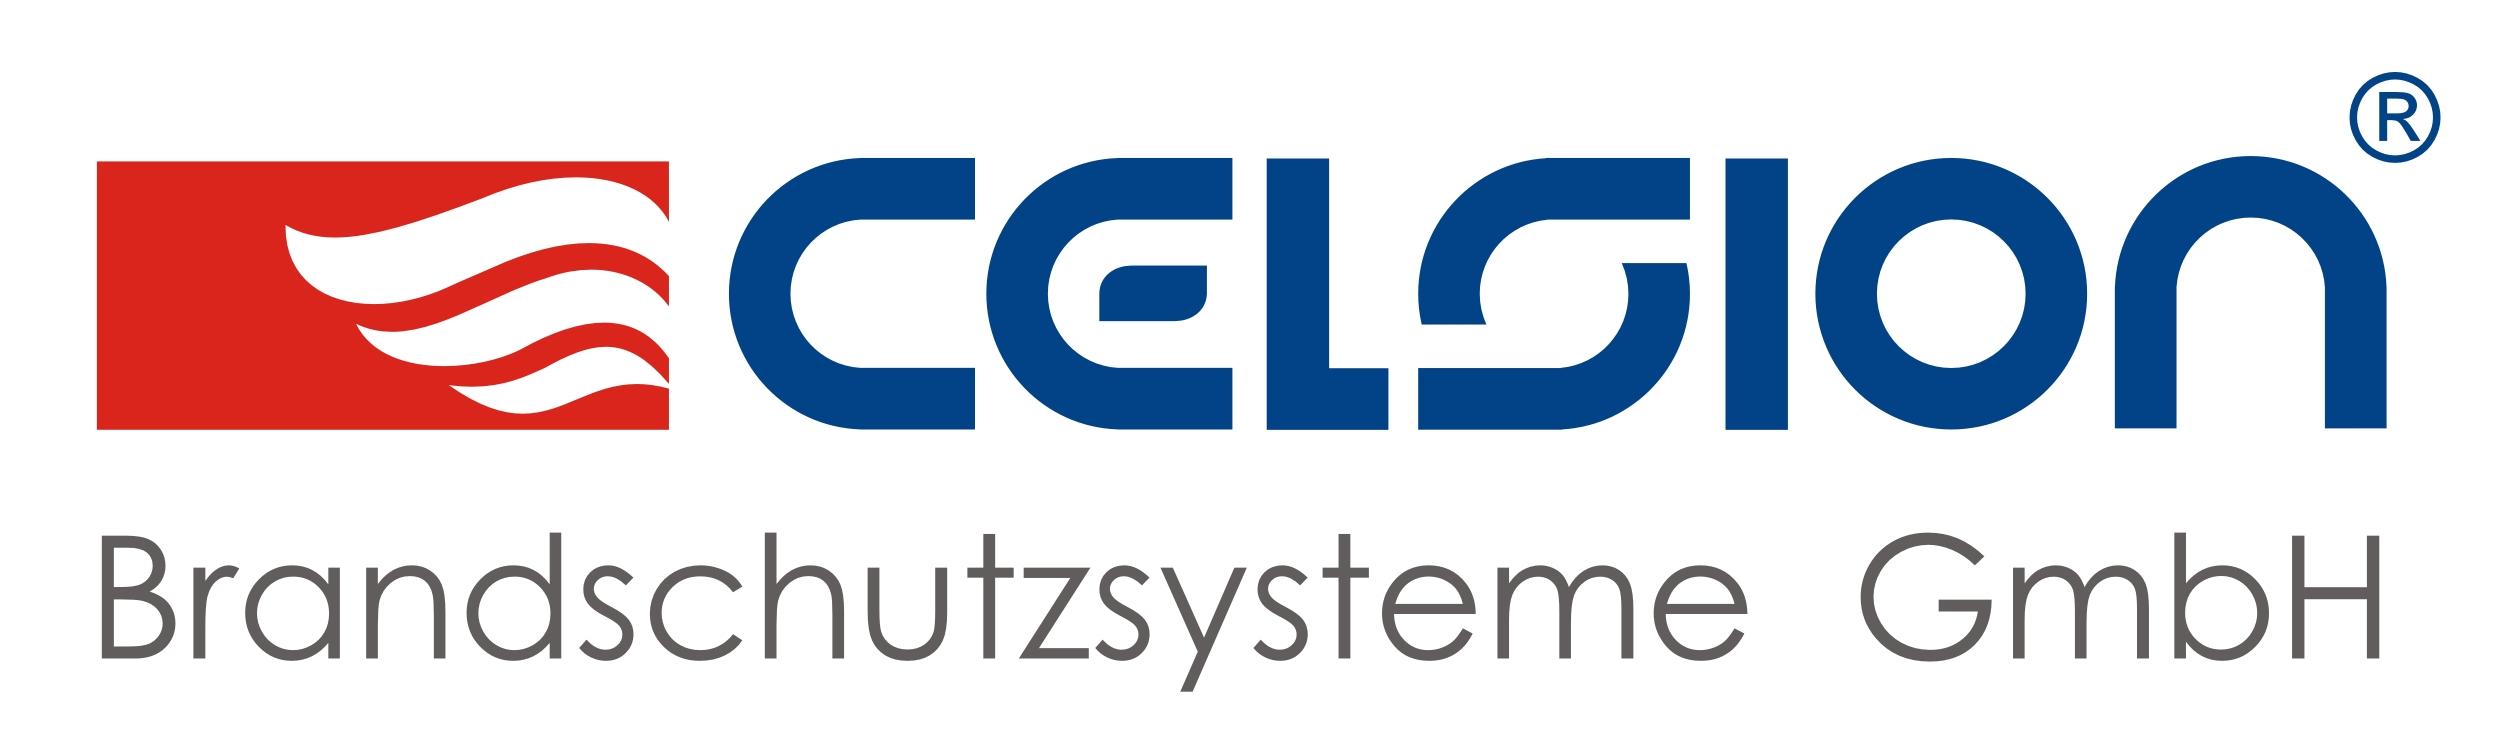 059_Celsion_Brandschutzlösungen_Logo